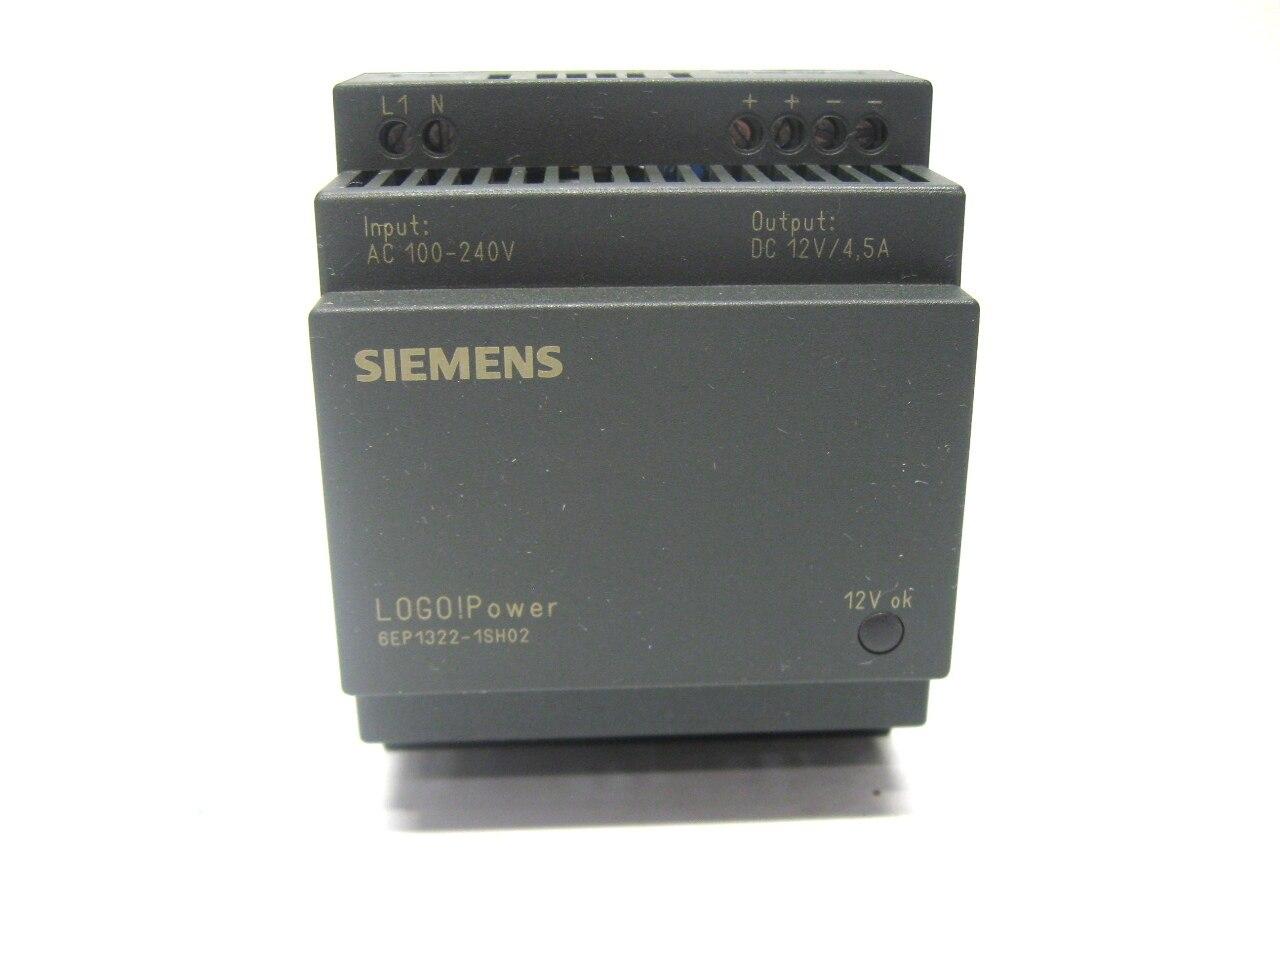 ip6337 siemens 6ep1322 1sh02 logo power supply 12 vdc output 100 240 vac input 3